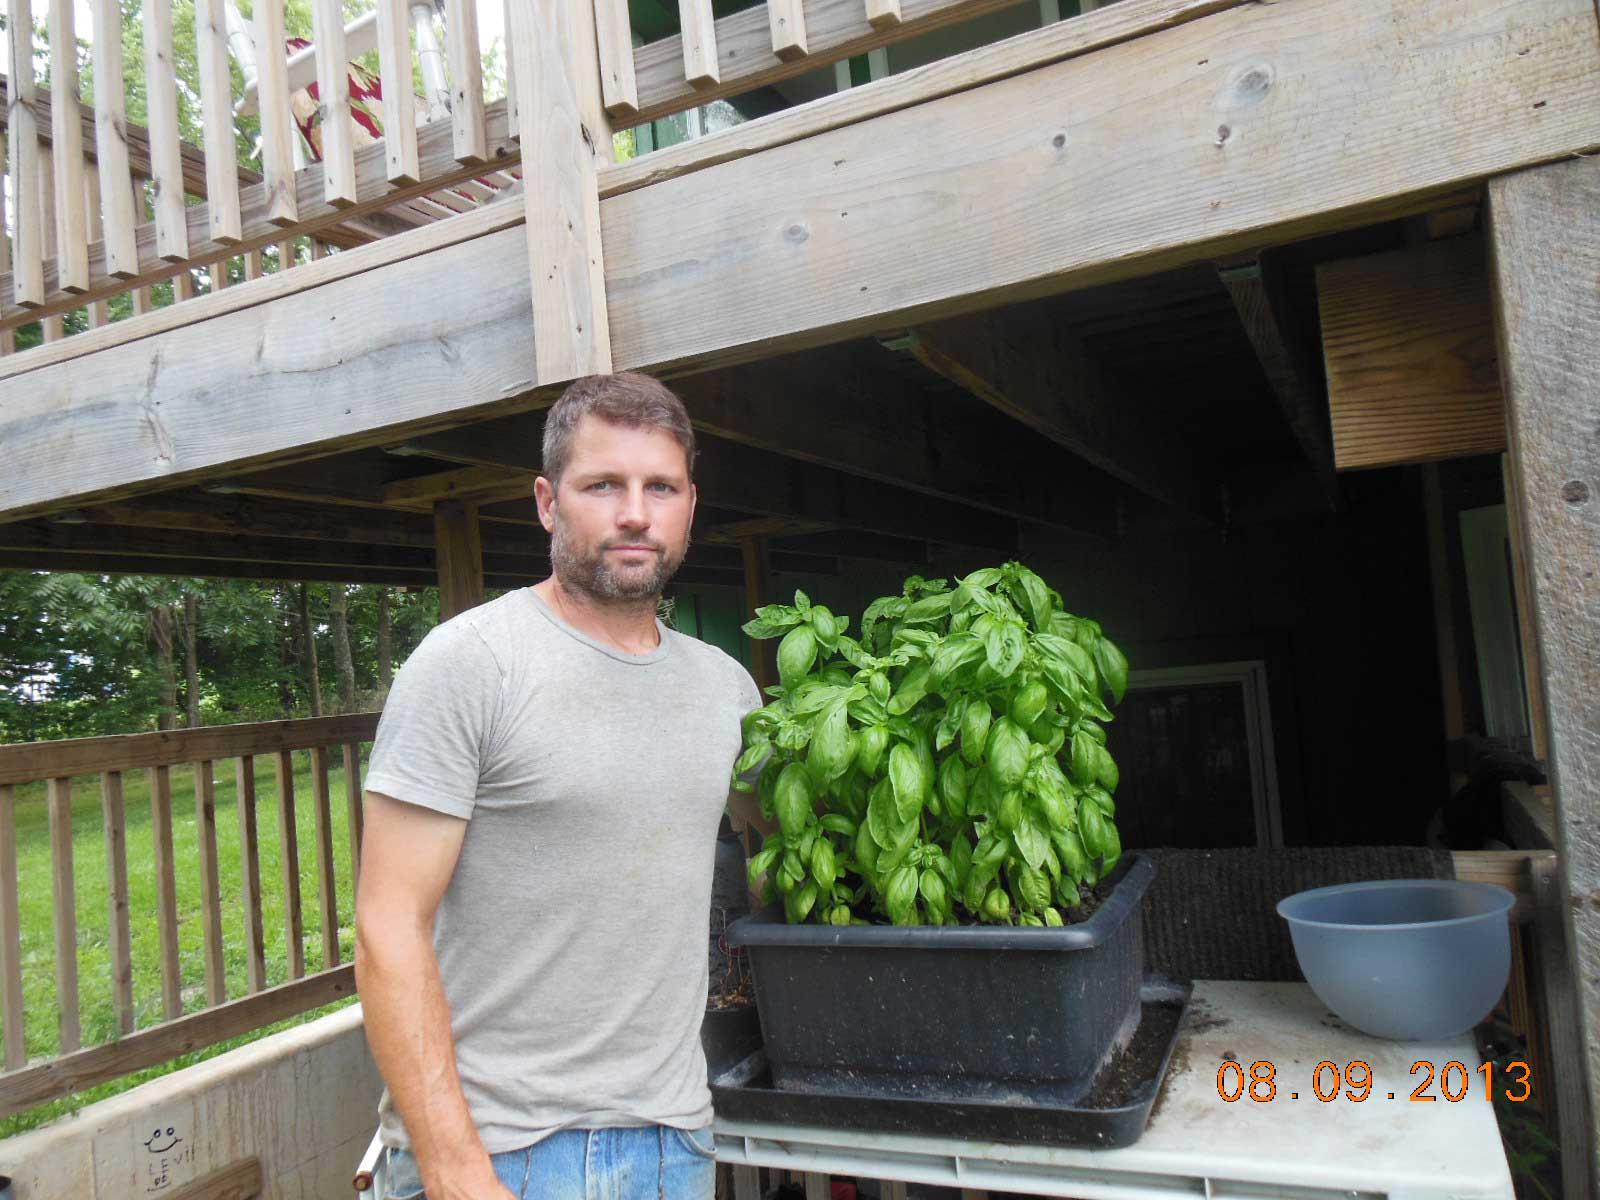 Basil growing in the urbin grower